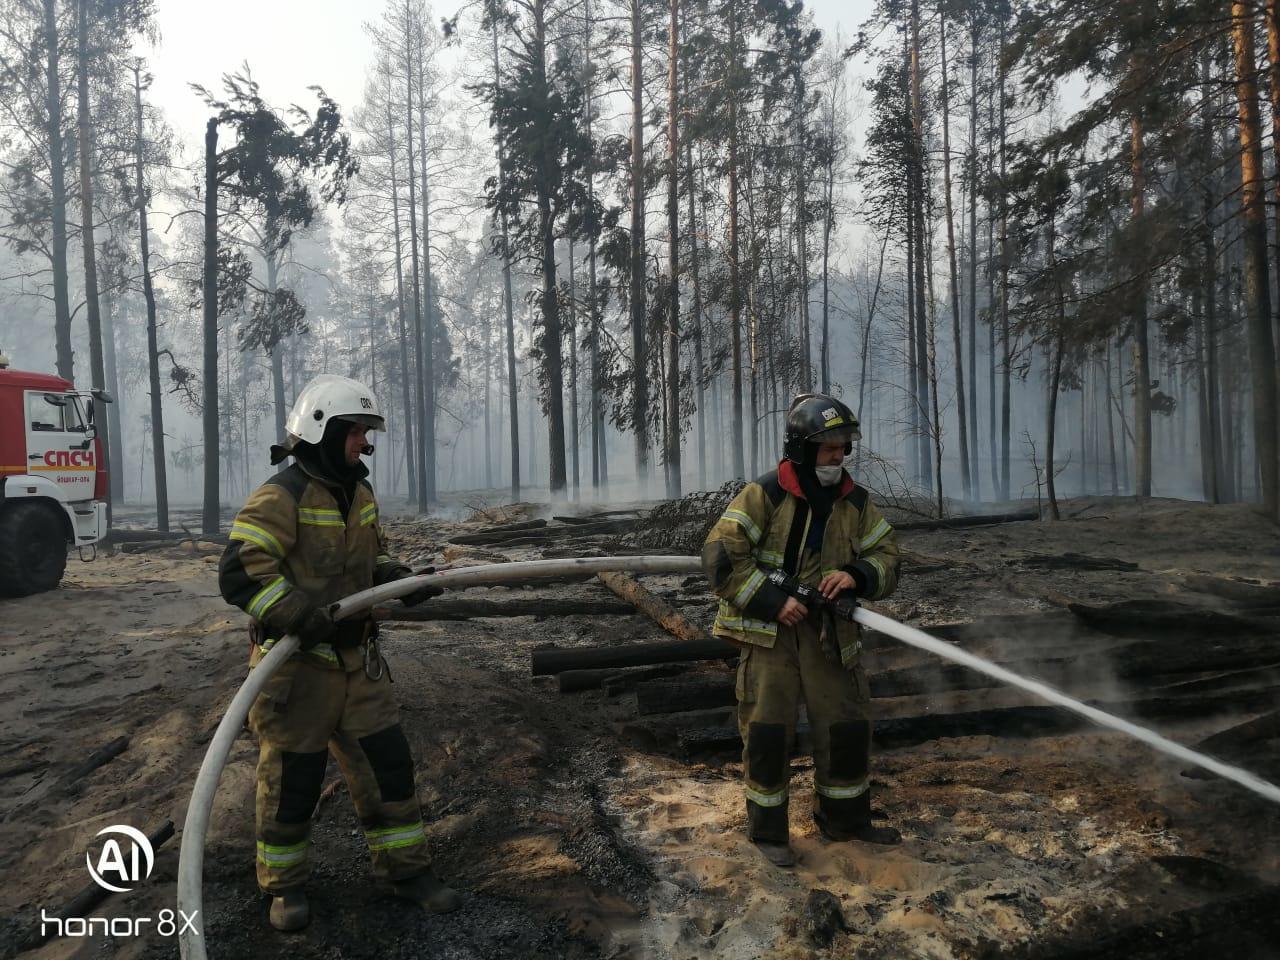 Активная площадь лесного пожара на территории Марий Эл увеличилась до 66,5 га